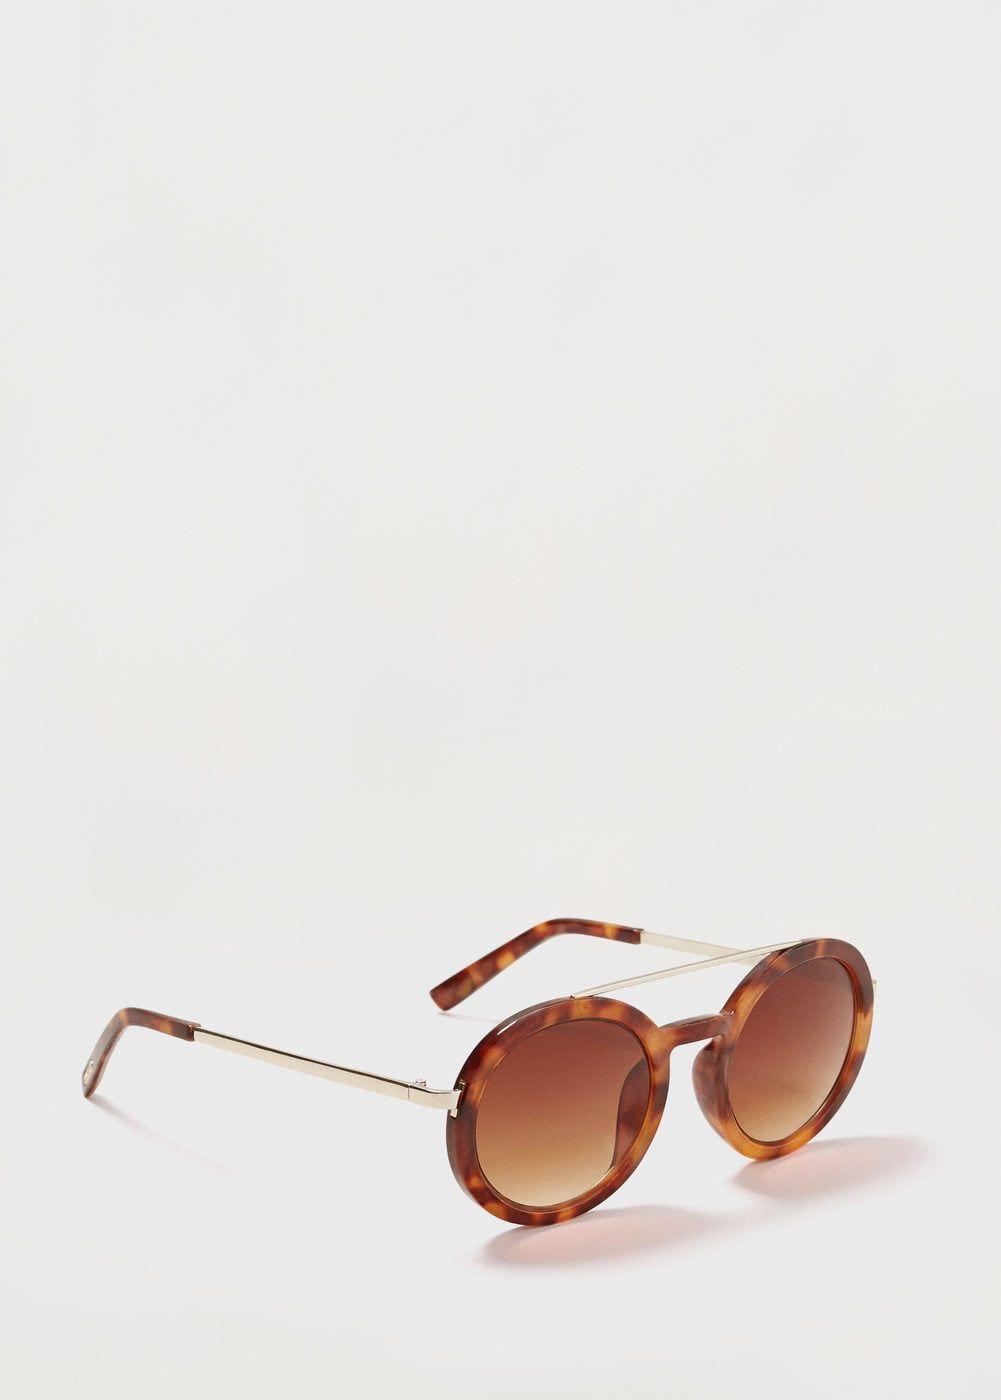 De Sol Gafas Montura Pasta MujerModa klXiTwPZuO